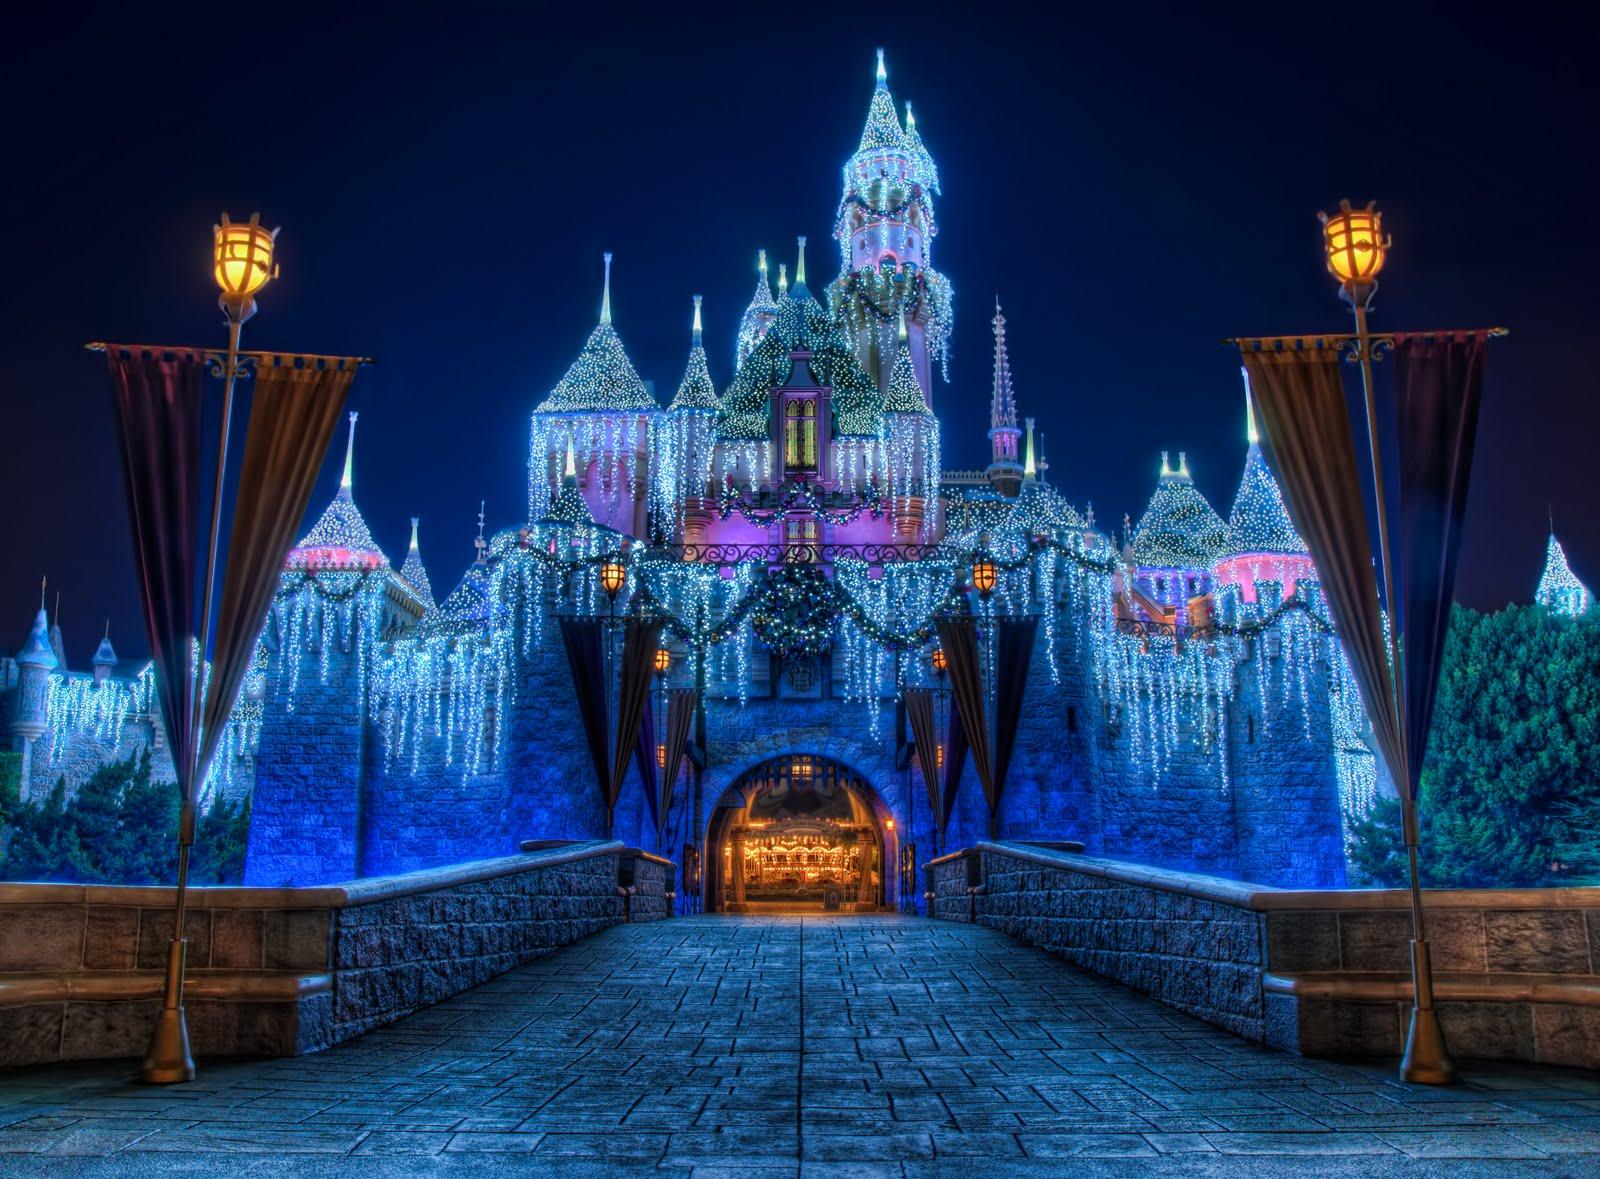 Wallpapers Disney Castle in Christmas Deskto Backgrounds Desktop 1600x1179